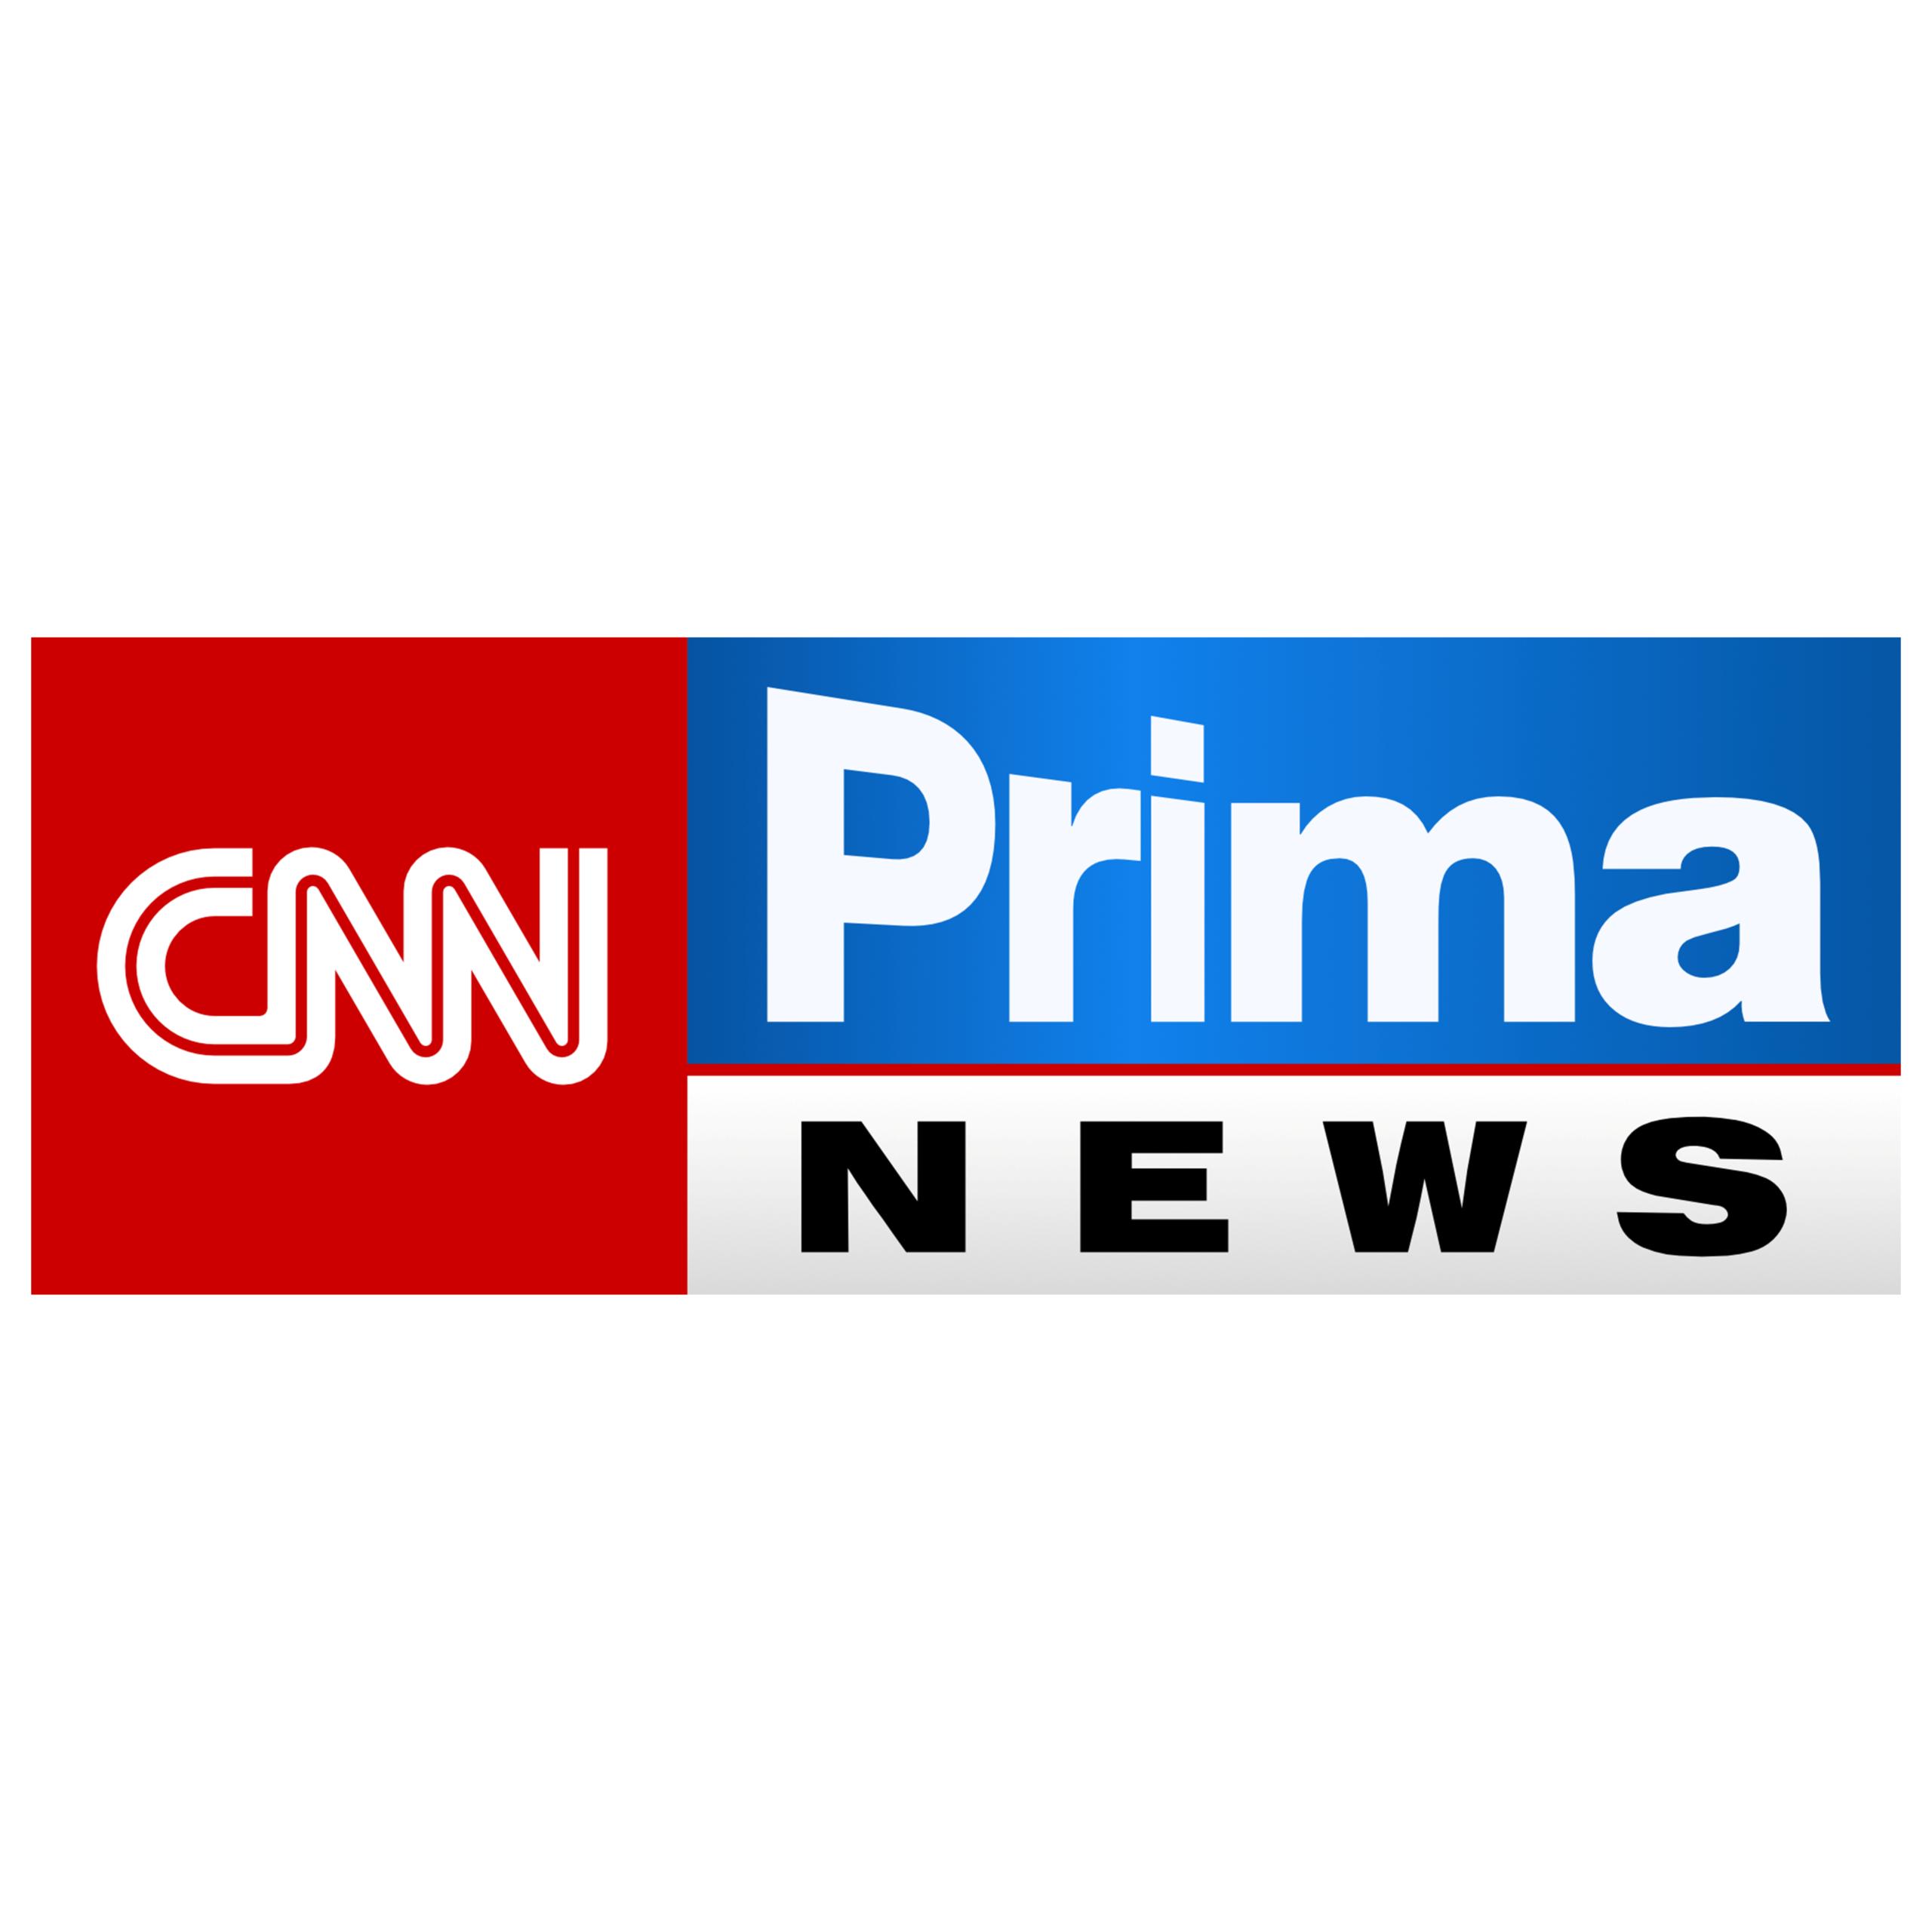 mimospace-cnn-prima-news-logo